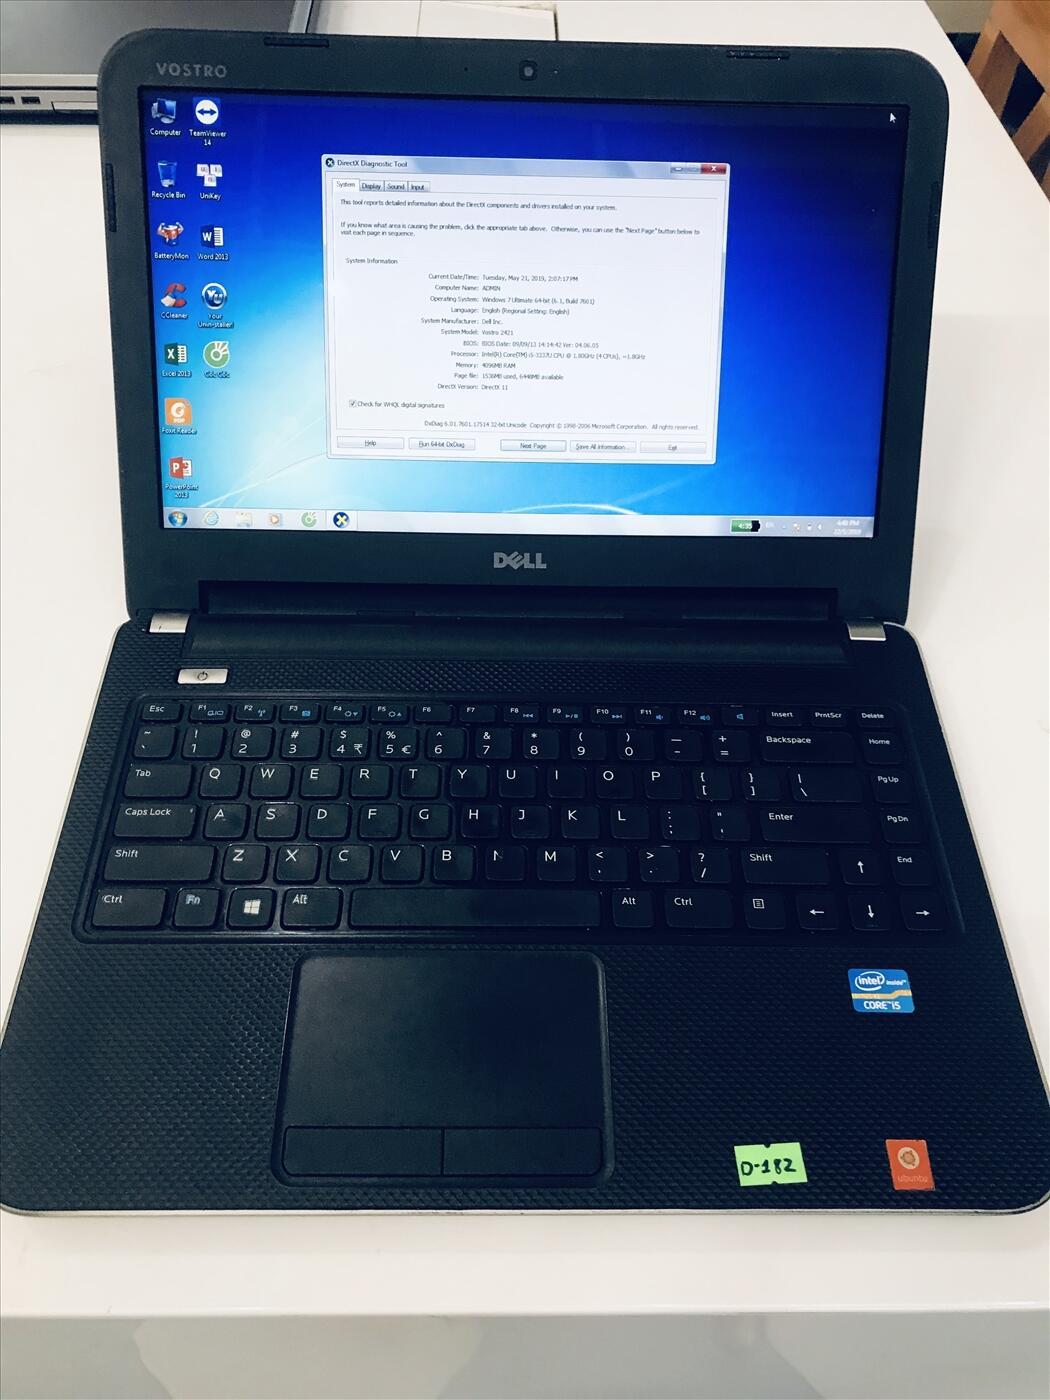 Dell Vostro 2421   i5-3337U~1.8GHz   Ram 4G/HDD 500G/14